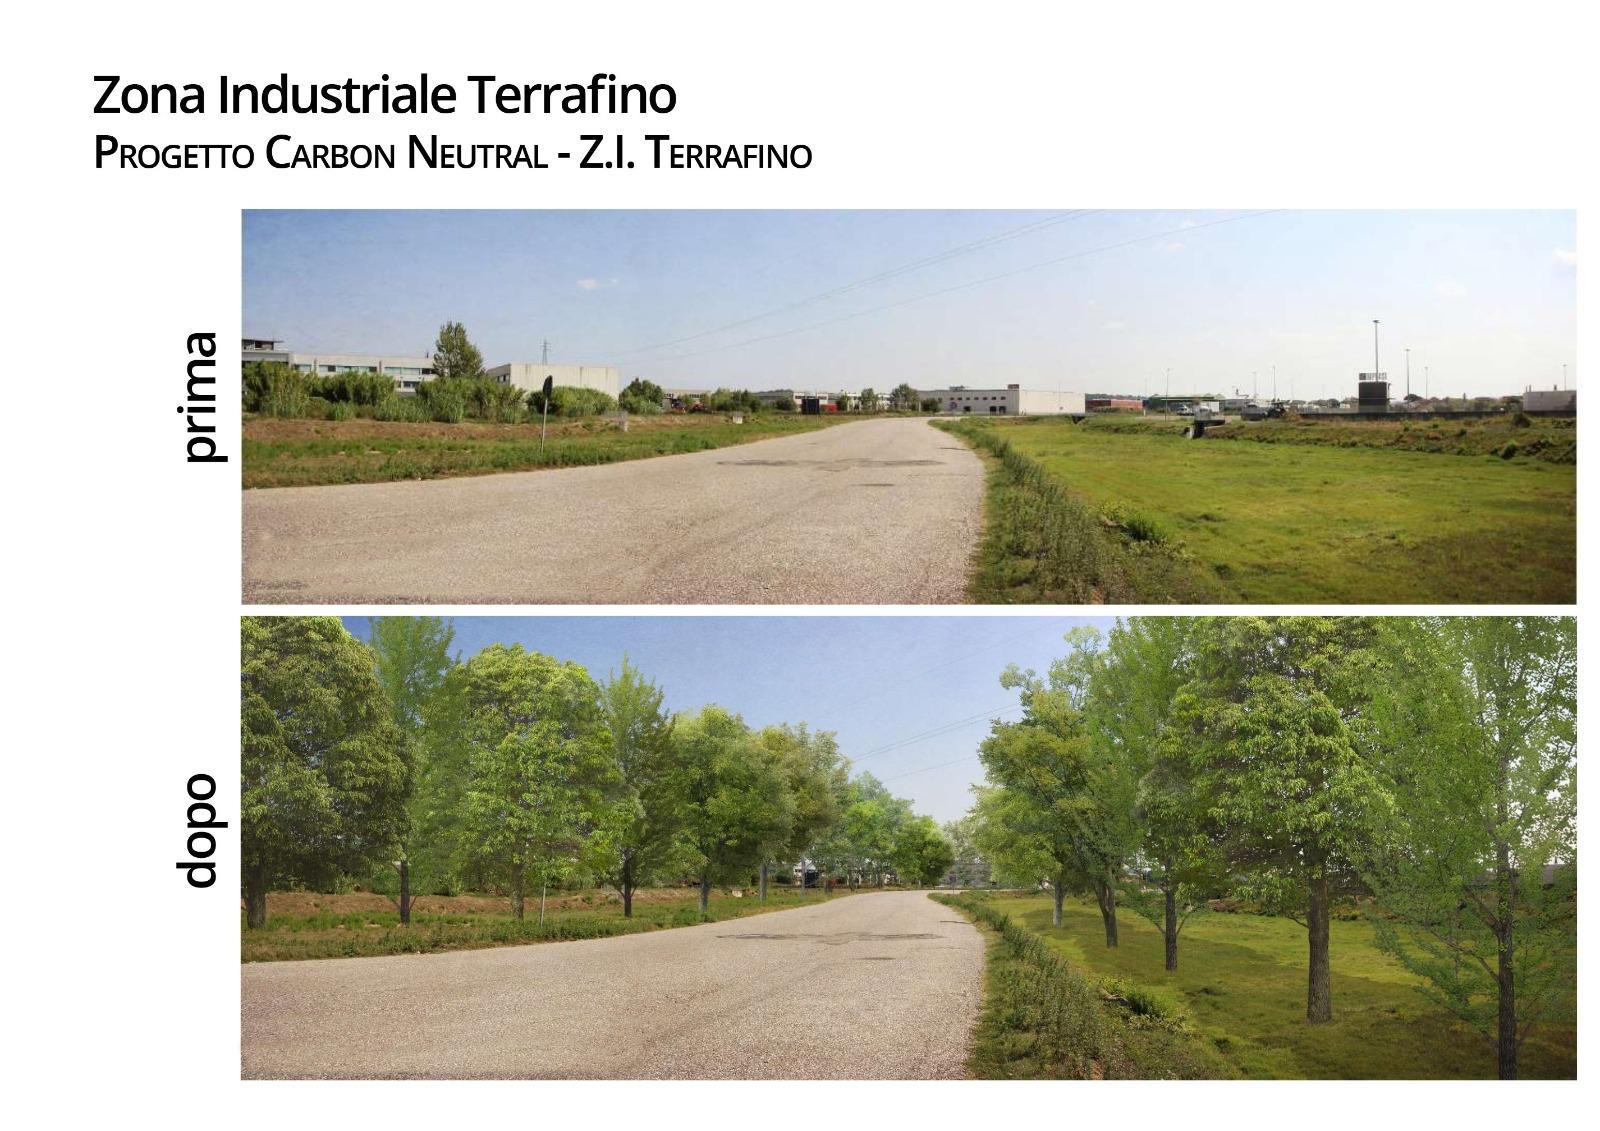 Zona Industriale Terrafino